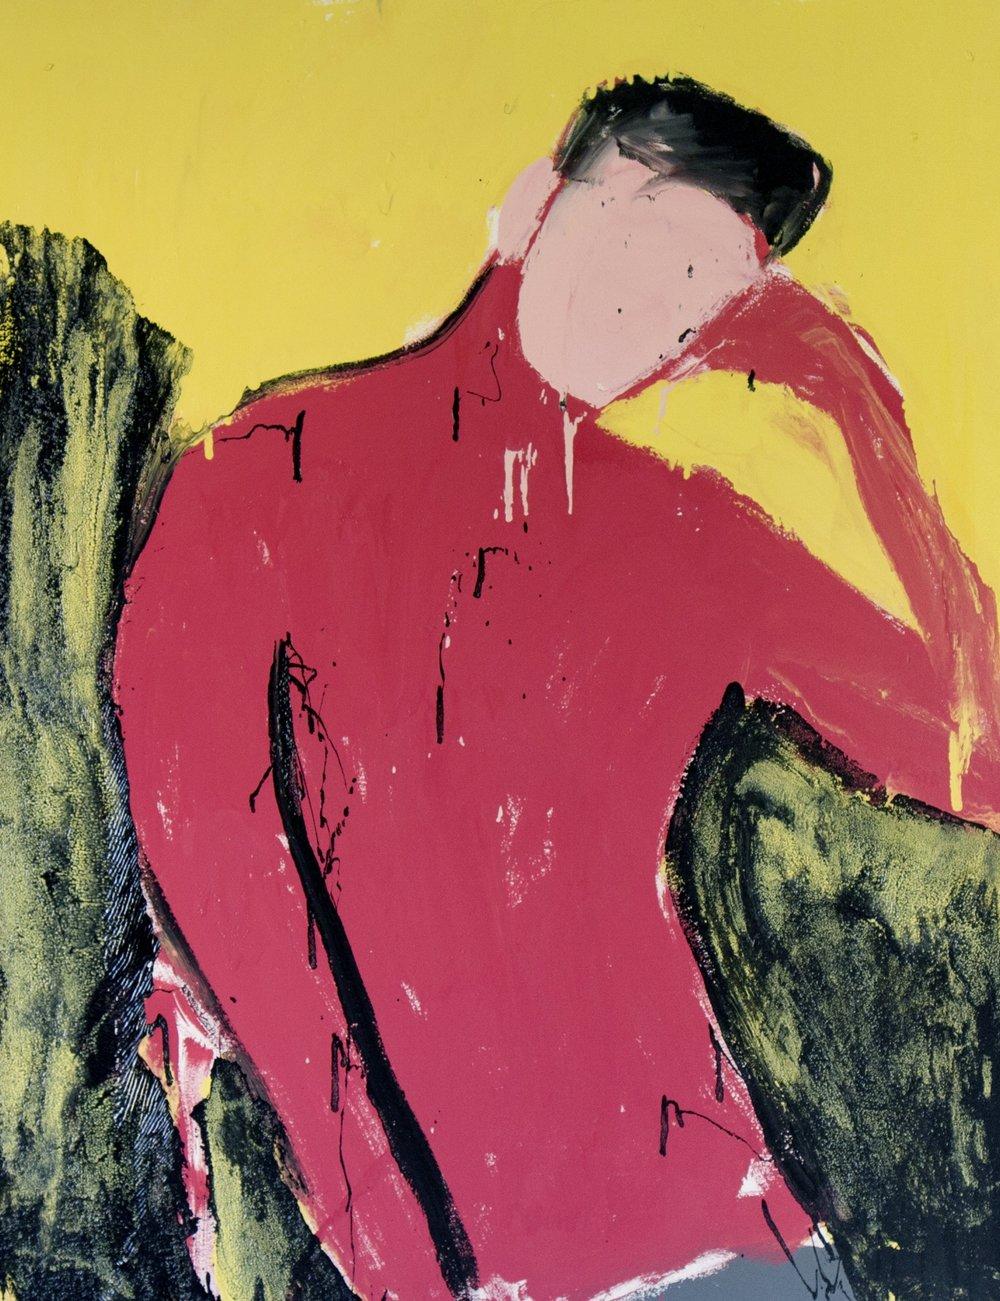 Awais II, 2017, enamel paint on canvas, 137 x 107 cm